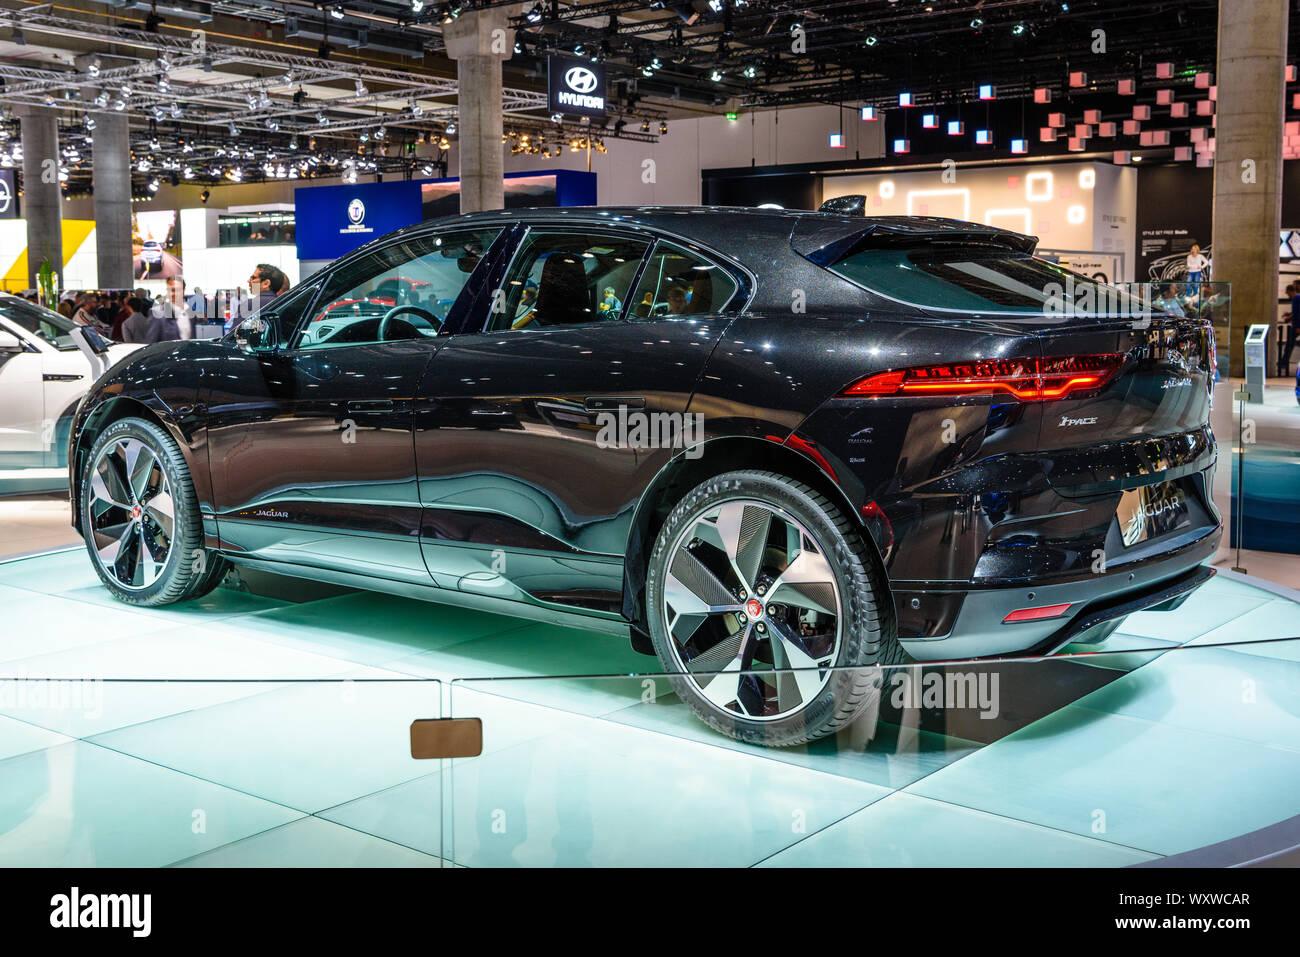 Frankfurt Germany Sept 2019 Black Jaguar I Space Is A Battery Electric Crossover Suv Produced By British Automotive Company Jaguar Land Rover Jlr Stock Photo Alamy